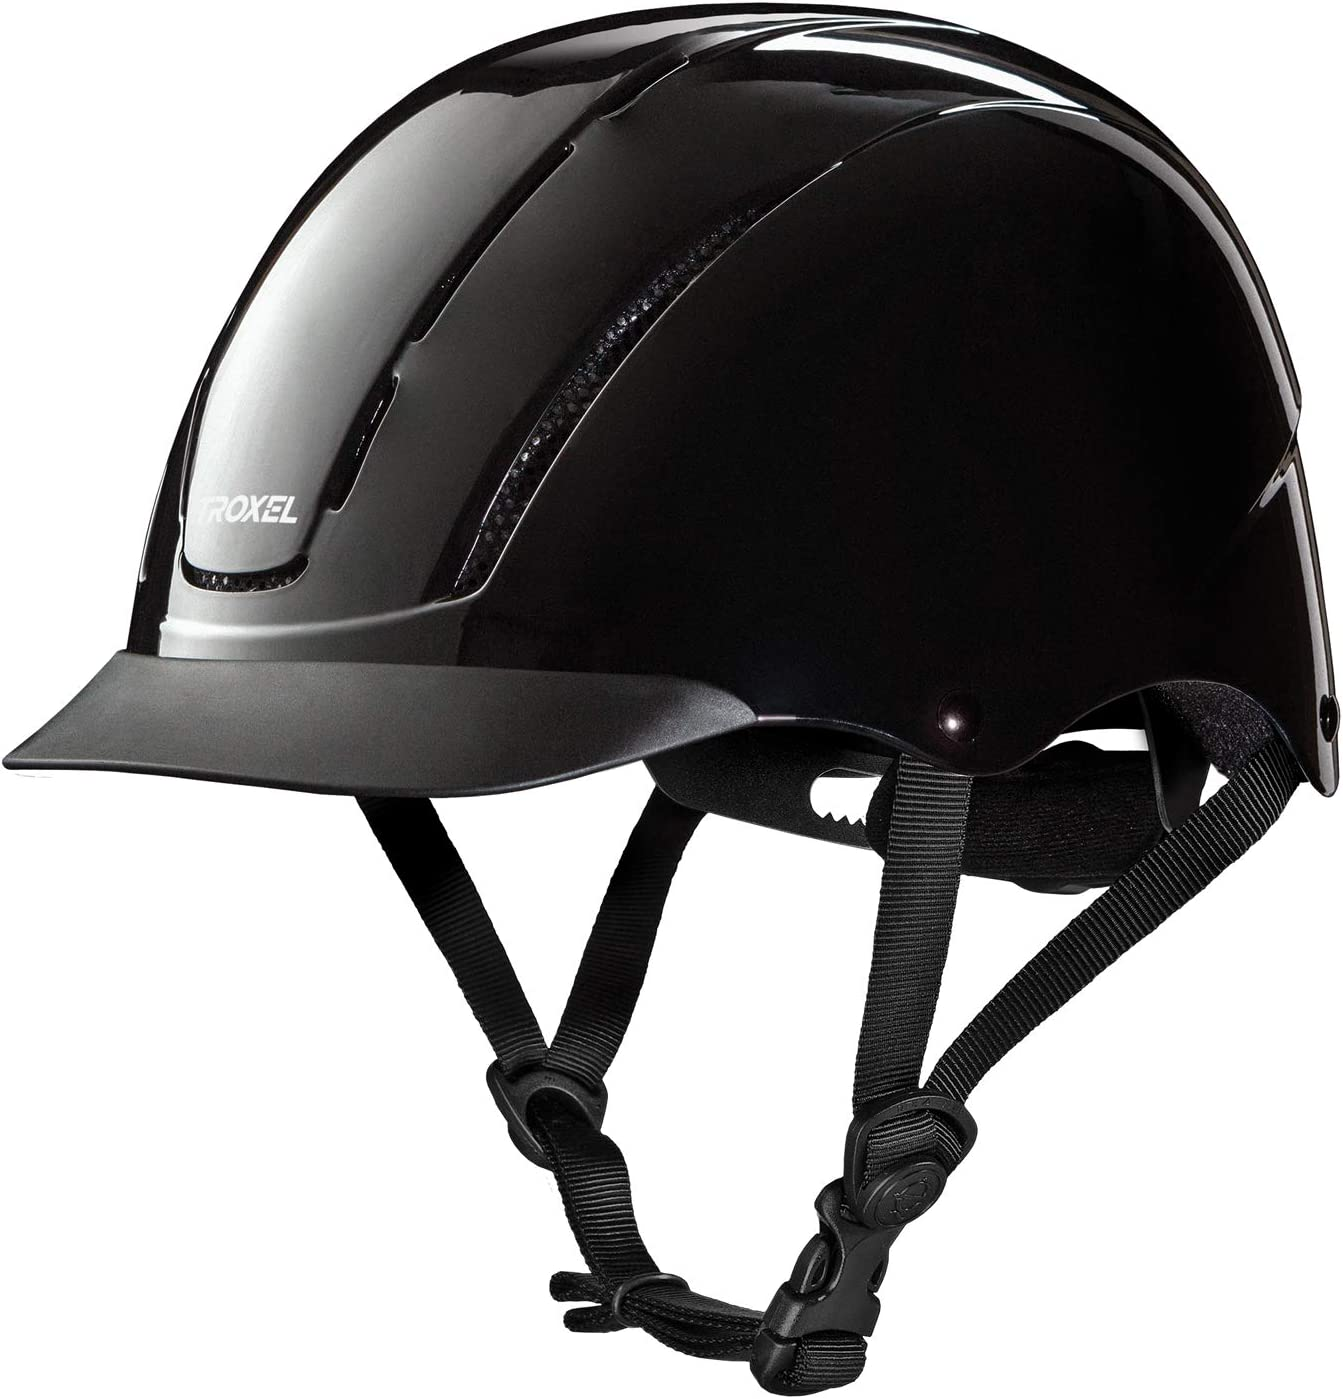 L,M,S Troxel Rebel Horse Riding Helmet Comfort Matte Finish Mesh Cover Flipfold